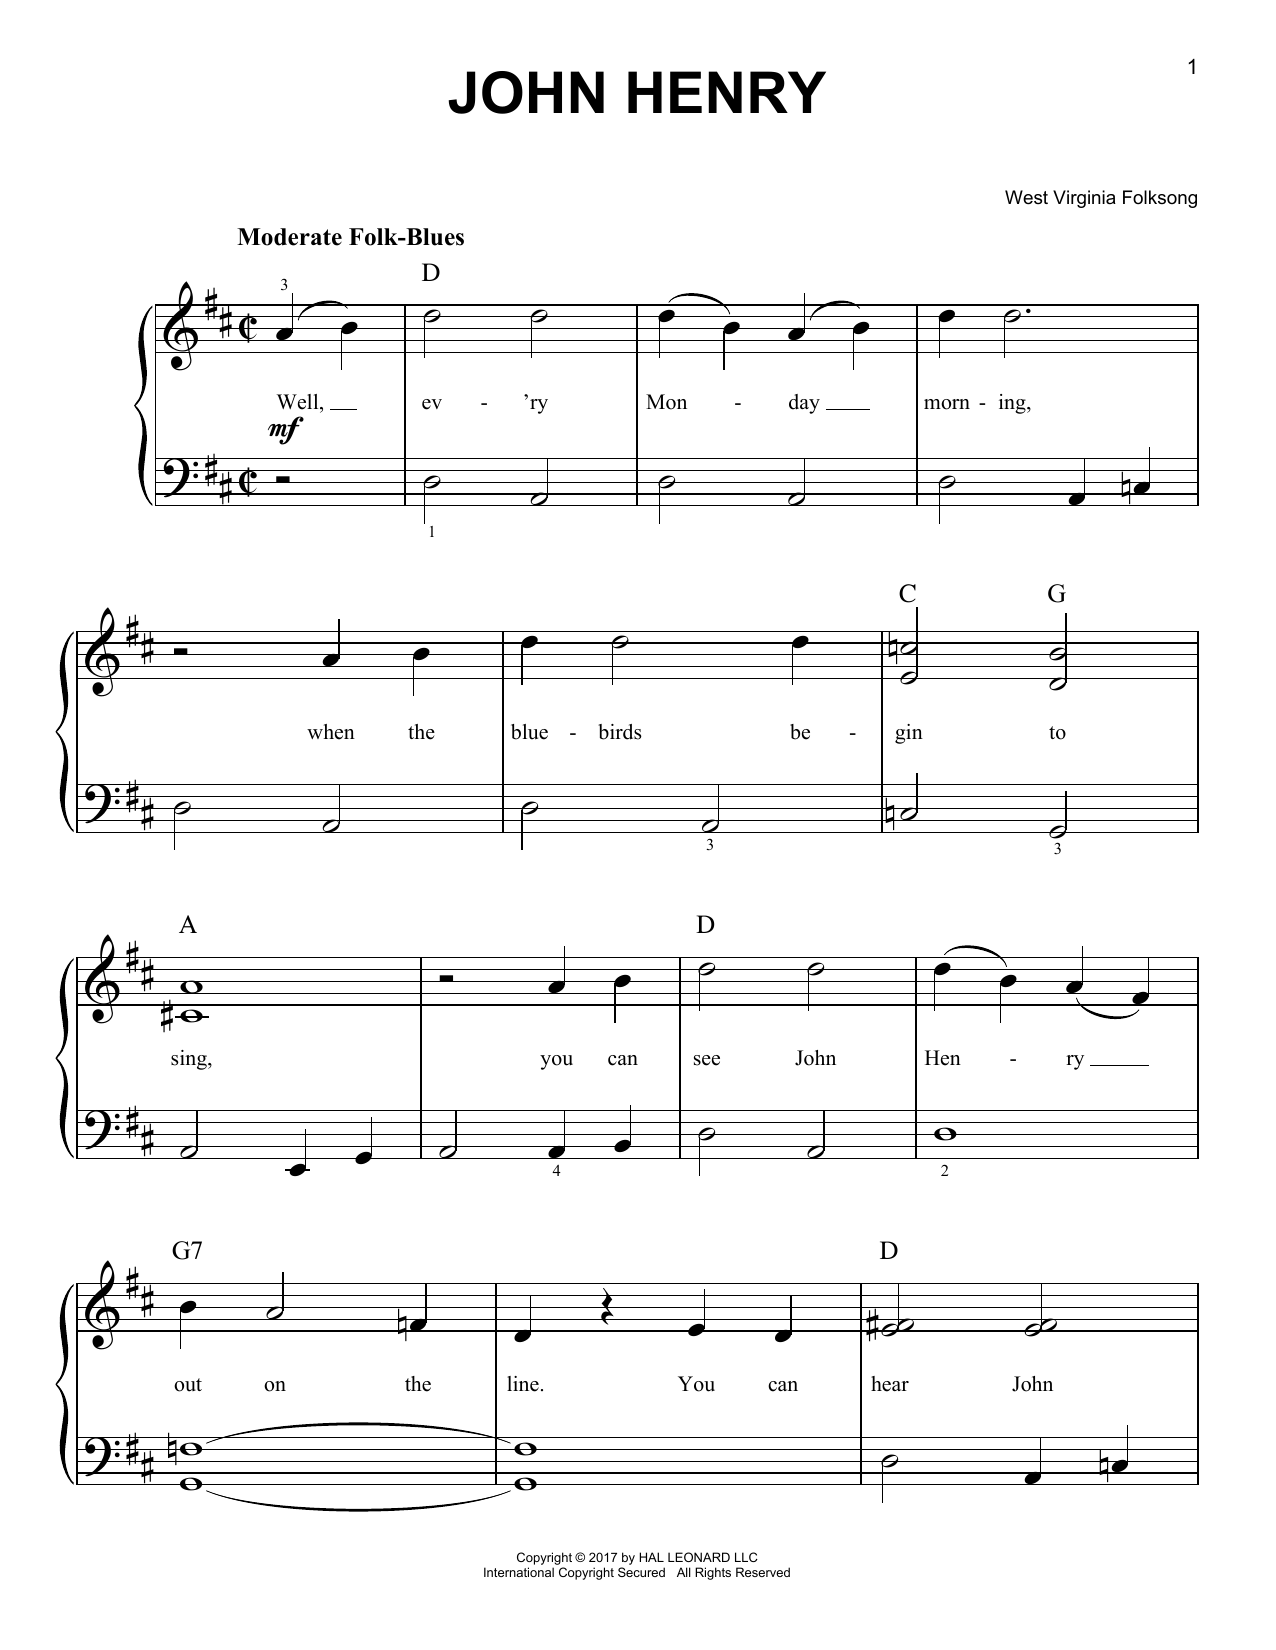 African-American Spiritual John Henry sheet music notes and chords. Download Printable PDF.